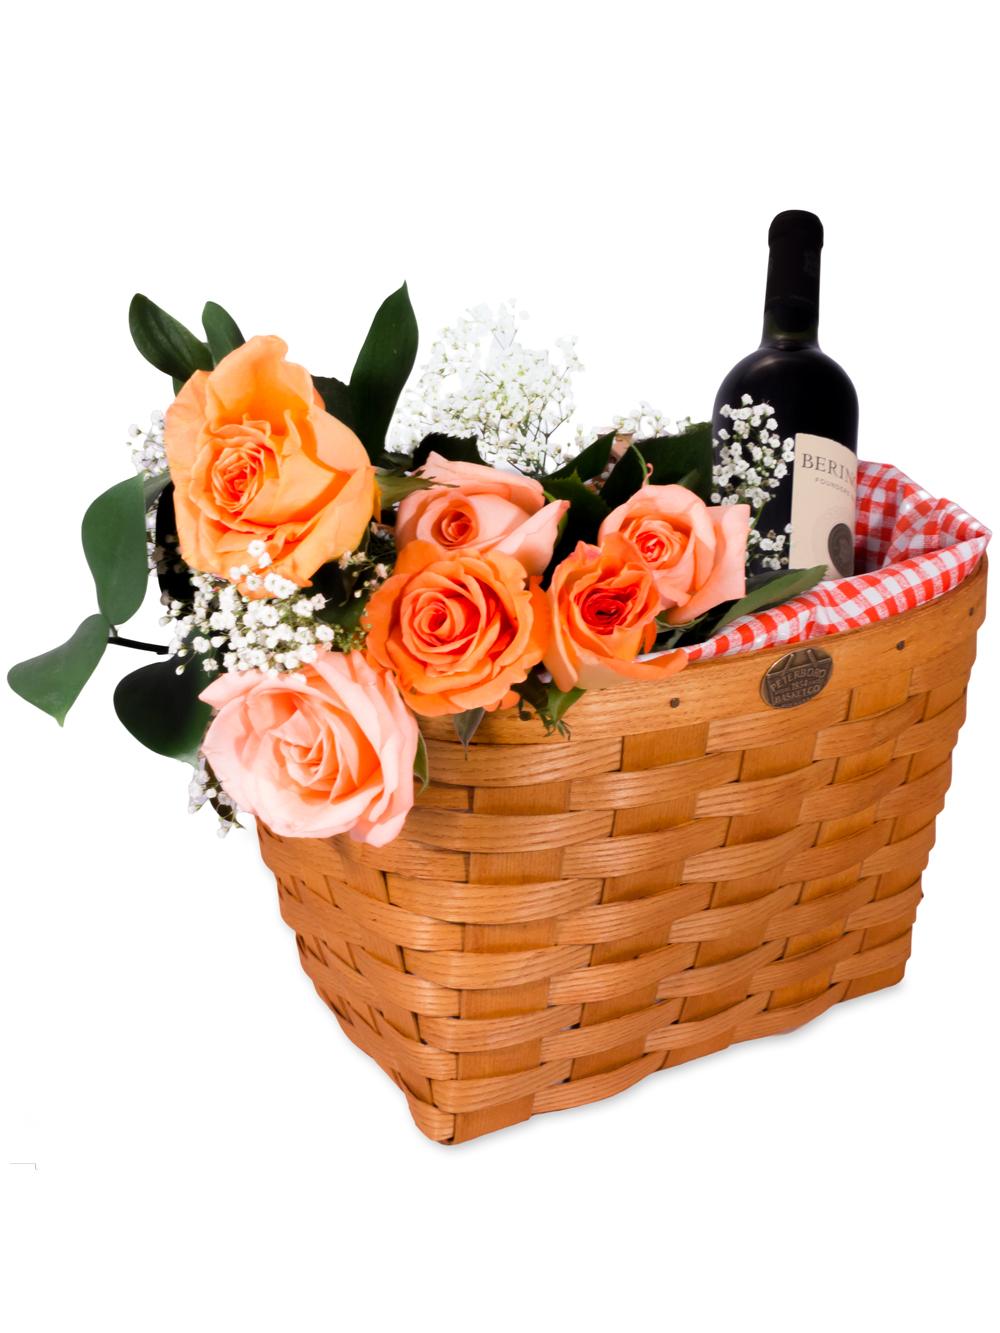 bike-basket-with-wine.jpg